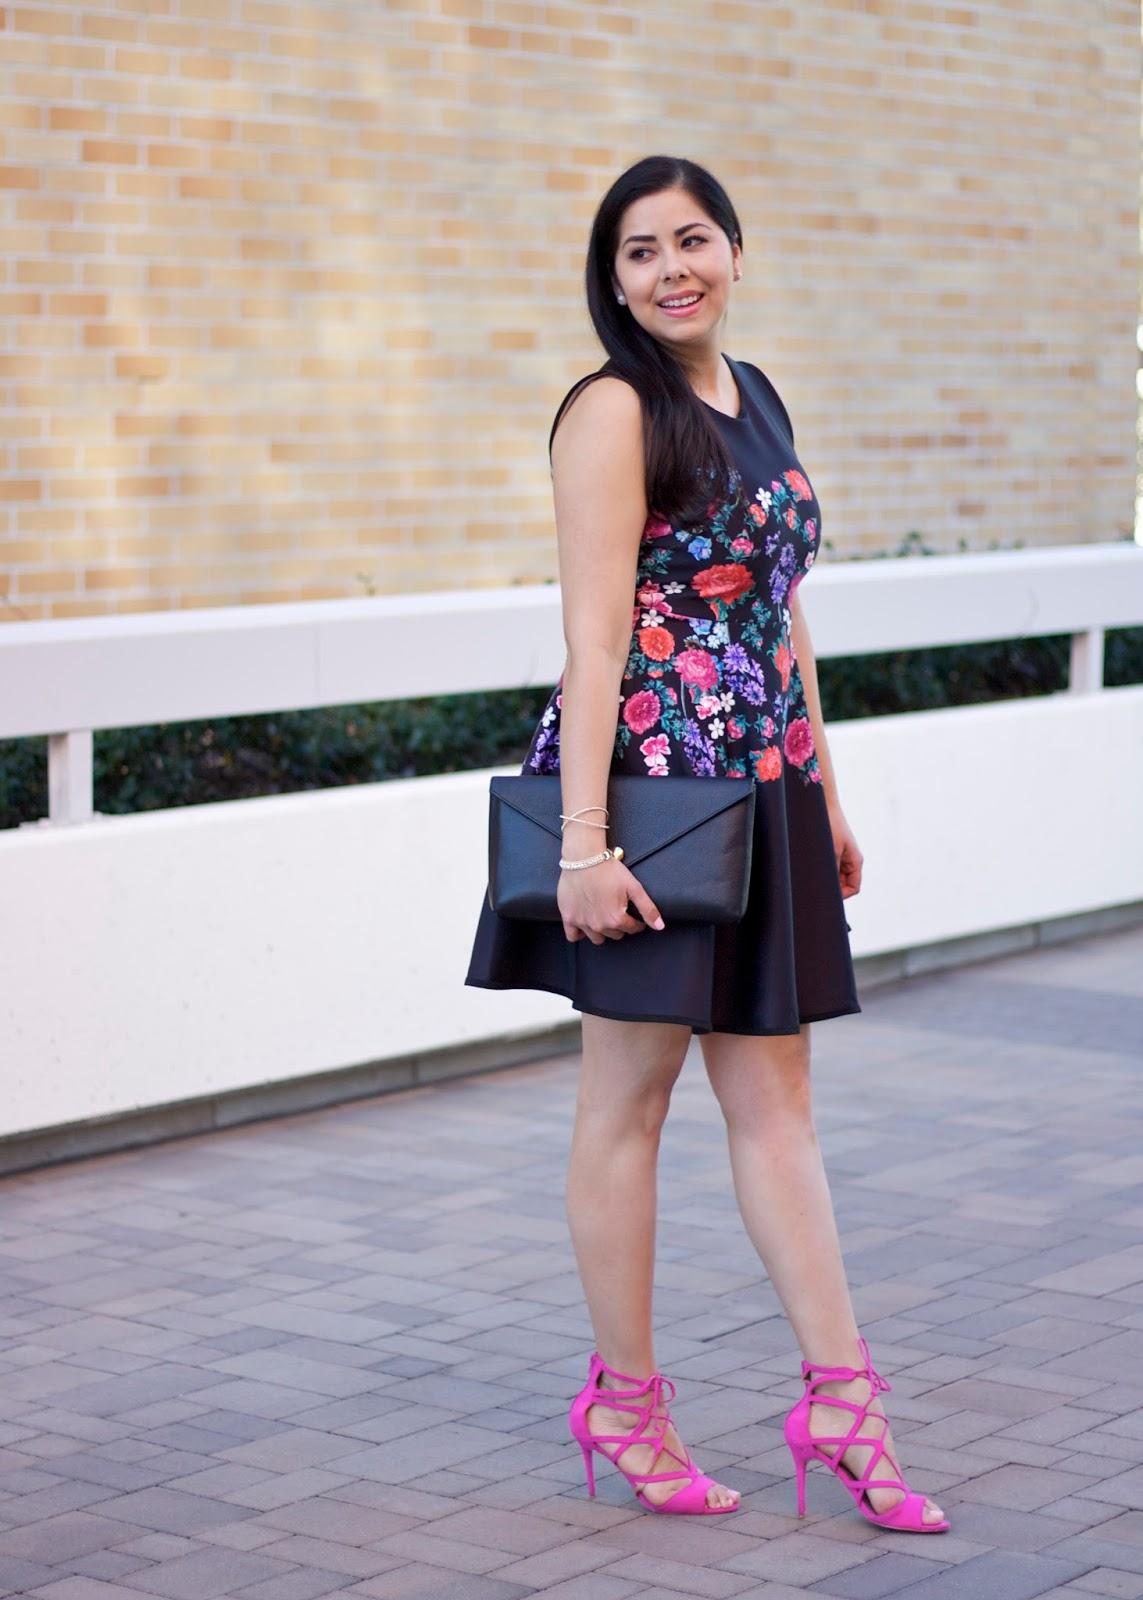 Hot pink heels, hot pink heeled sandals, pink lace up heels, justfab hot pink heels, just fab sandals